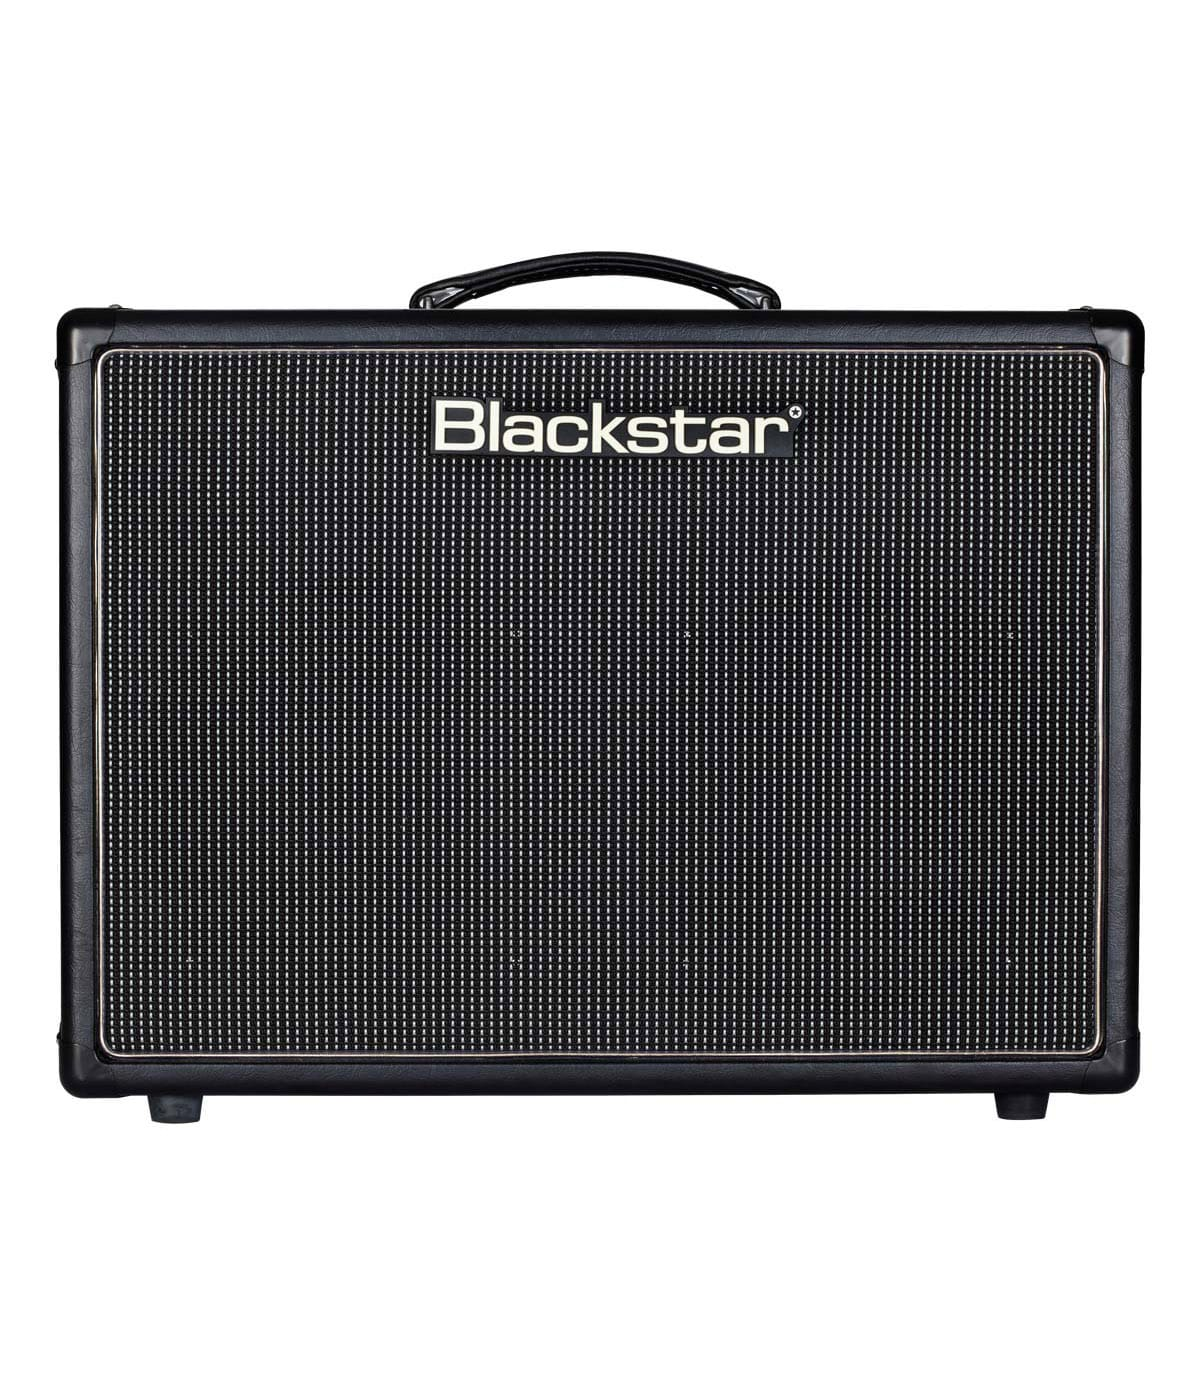 Blackstar - HT 5210 2 X 10 Valve 5 Watt Combo Amp